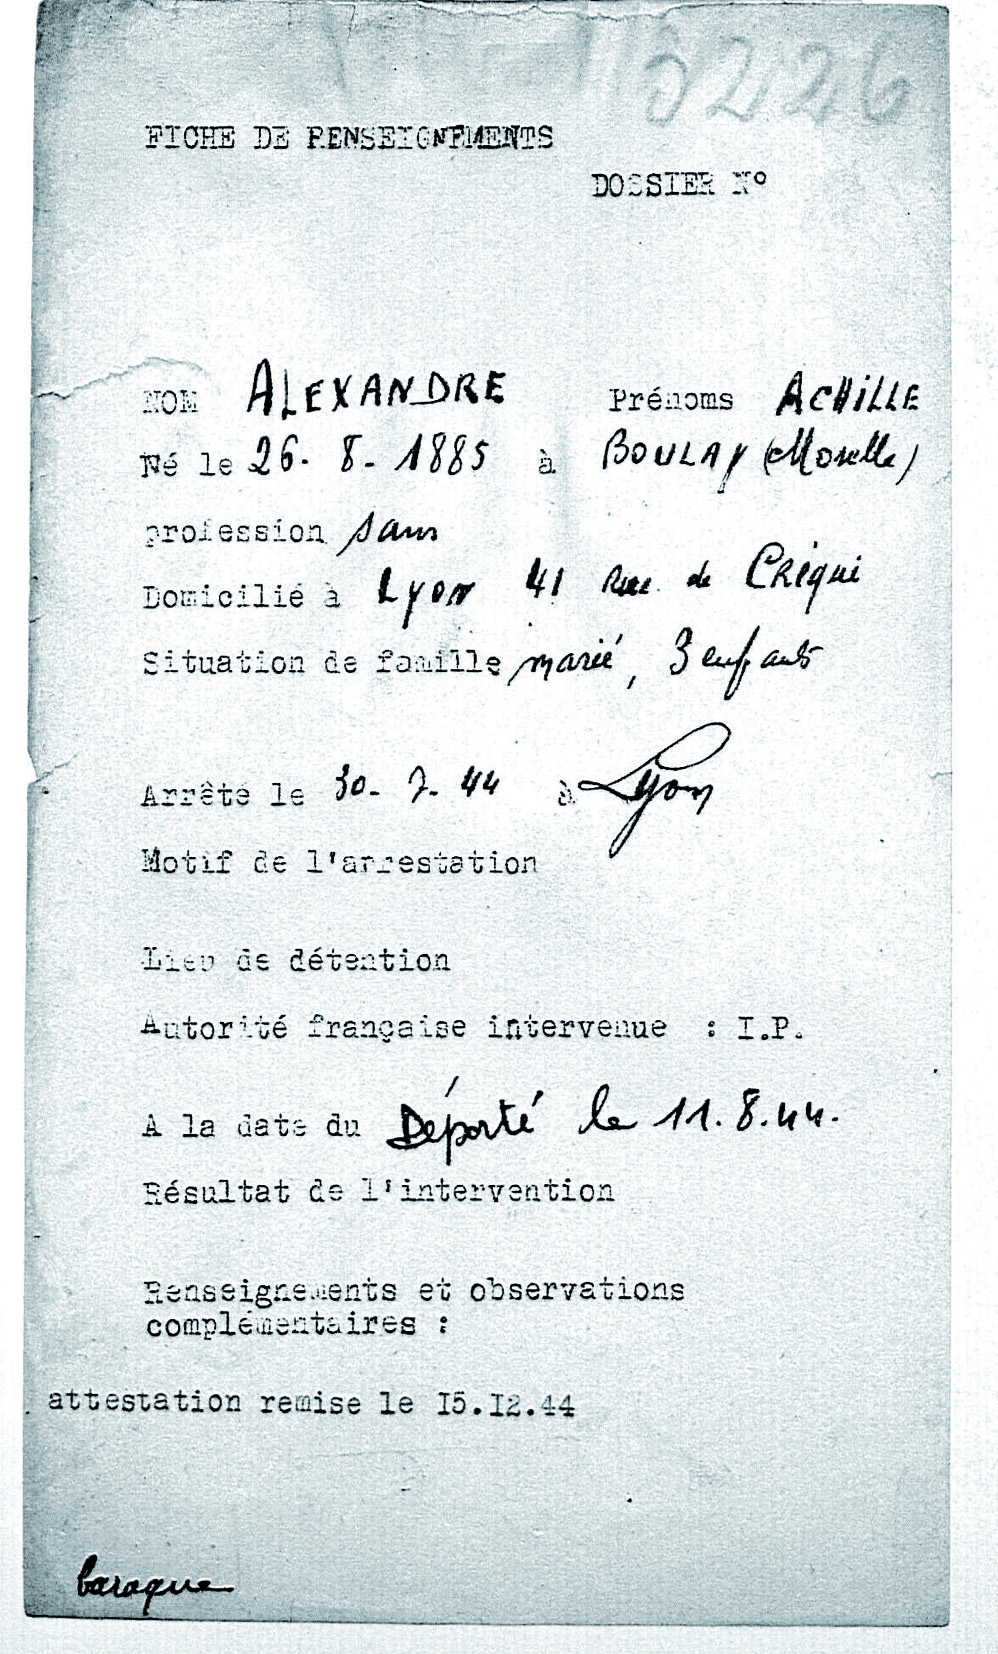 Alexandre / Lyon